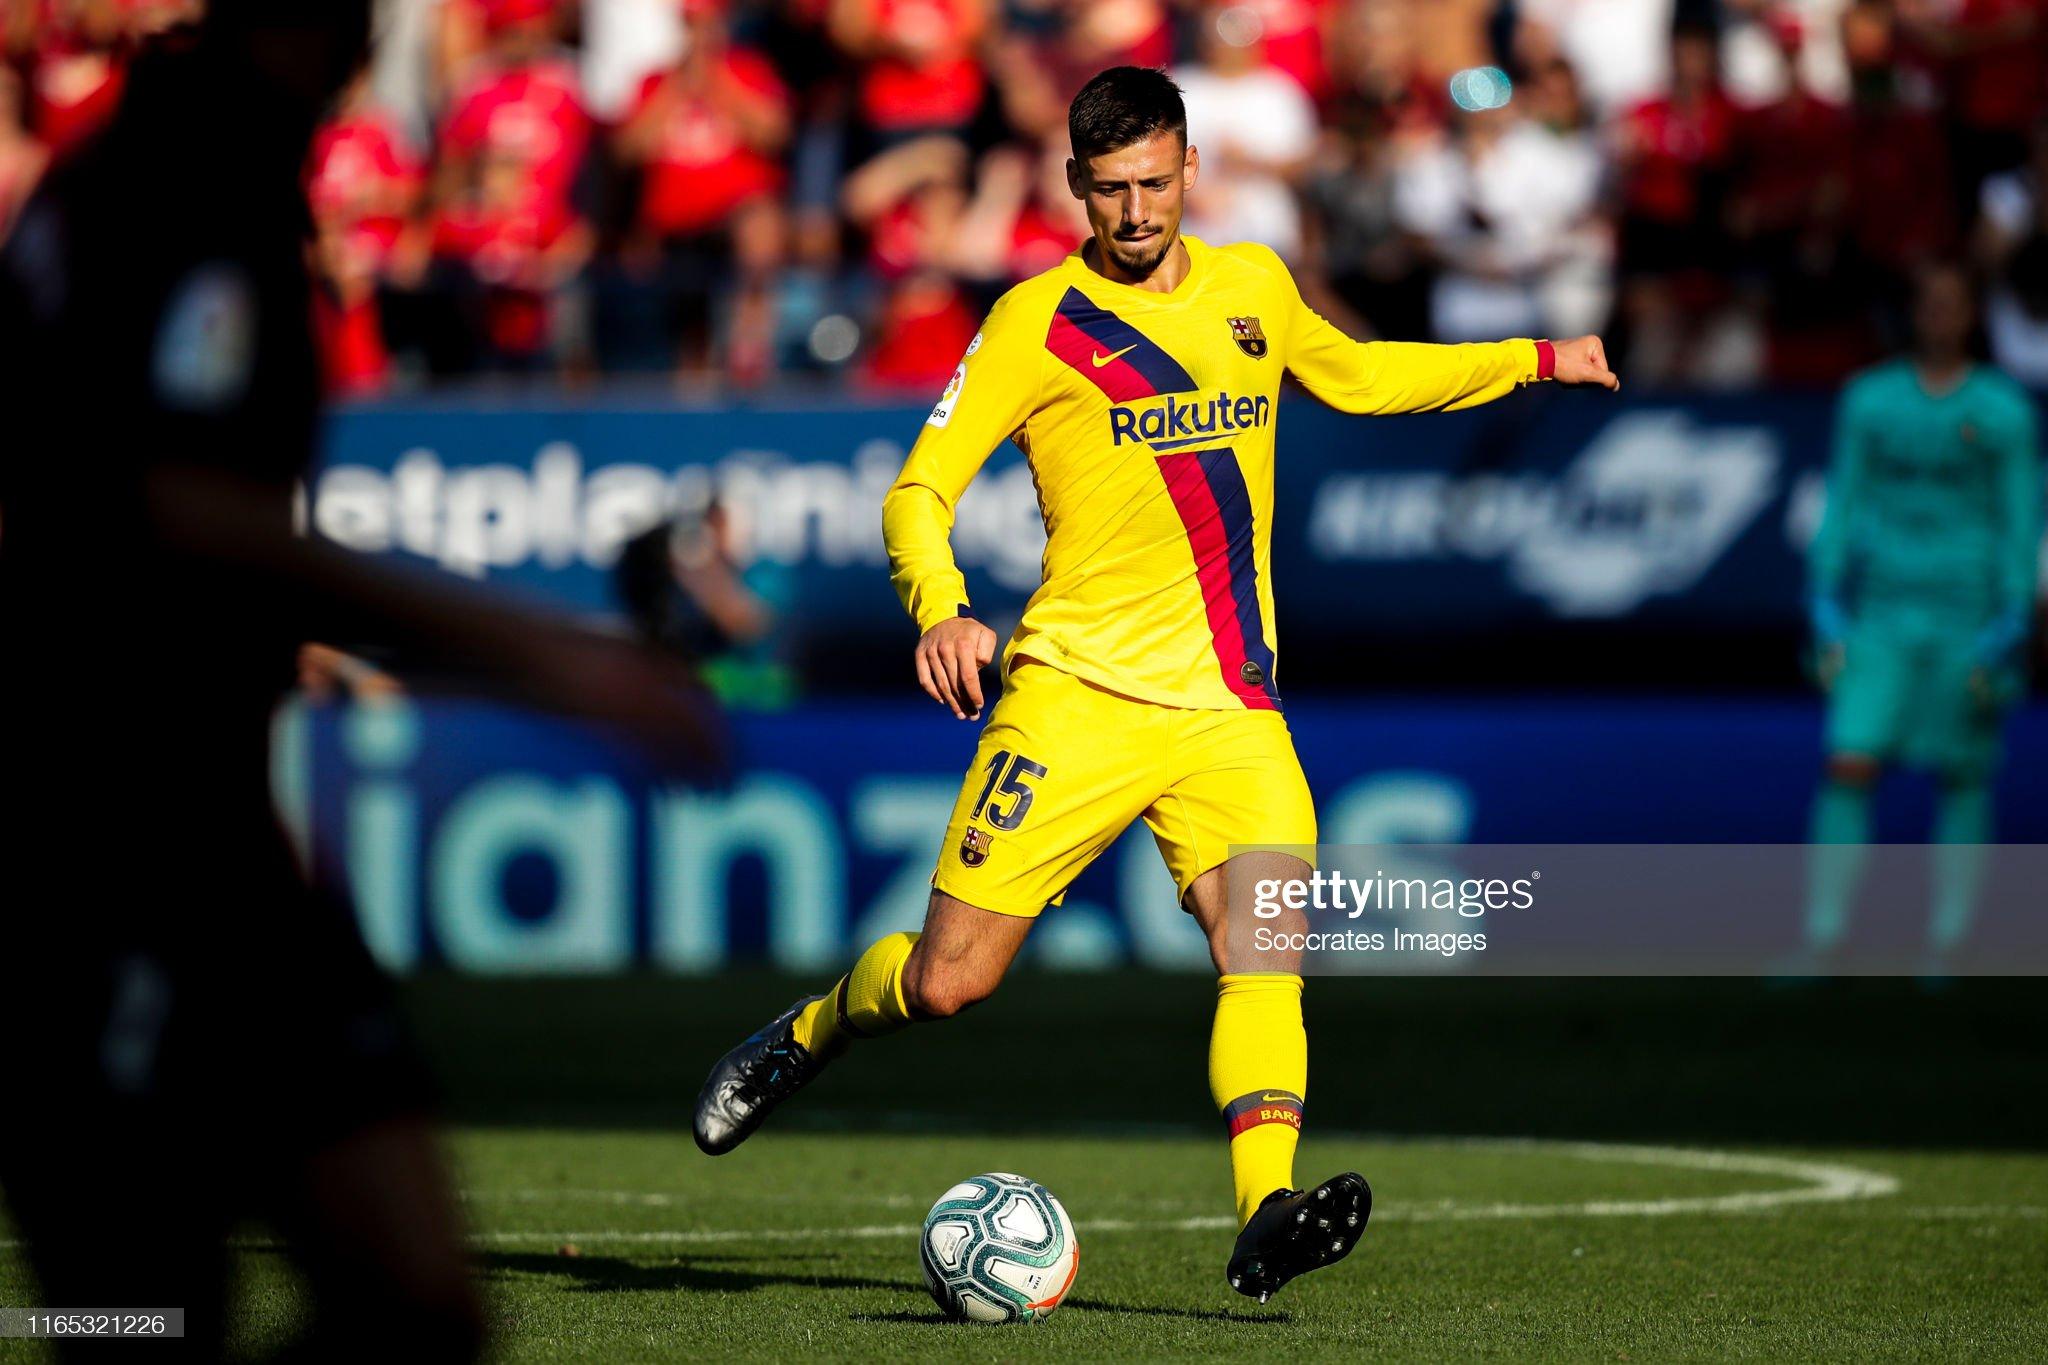 صور مباراة : أوساسونا - برشلونة 2-2 ( 31-08-2019 )  Clement-lenglet-of-fc-barcelona-during-the-la-liga-santander-match-picture-id1165321226?s=2048x2048